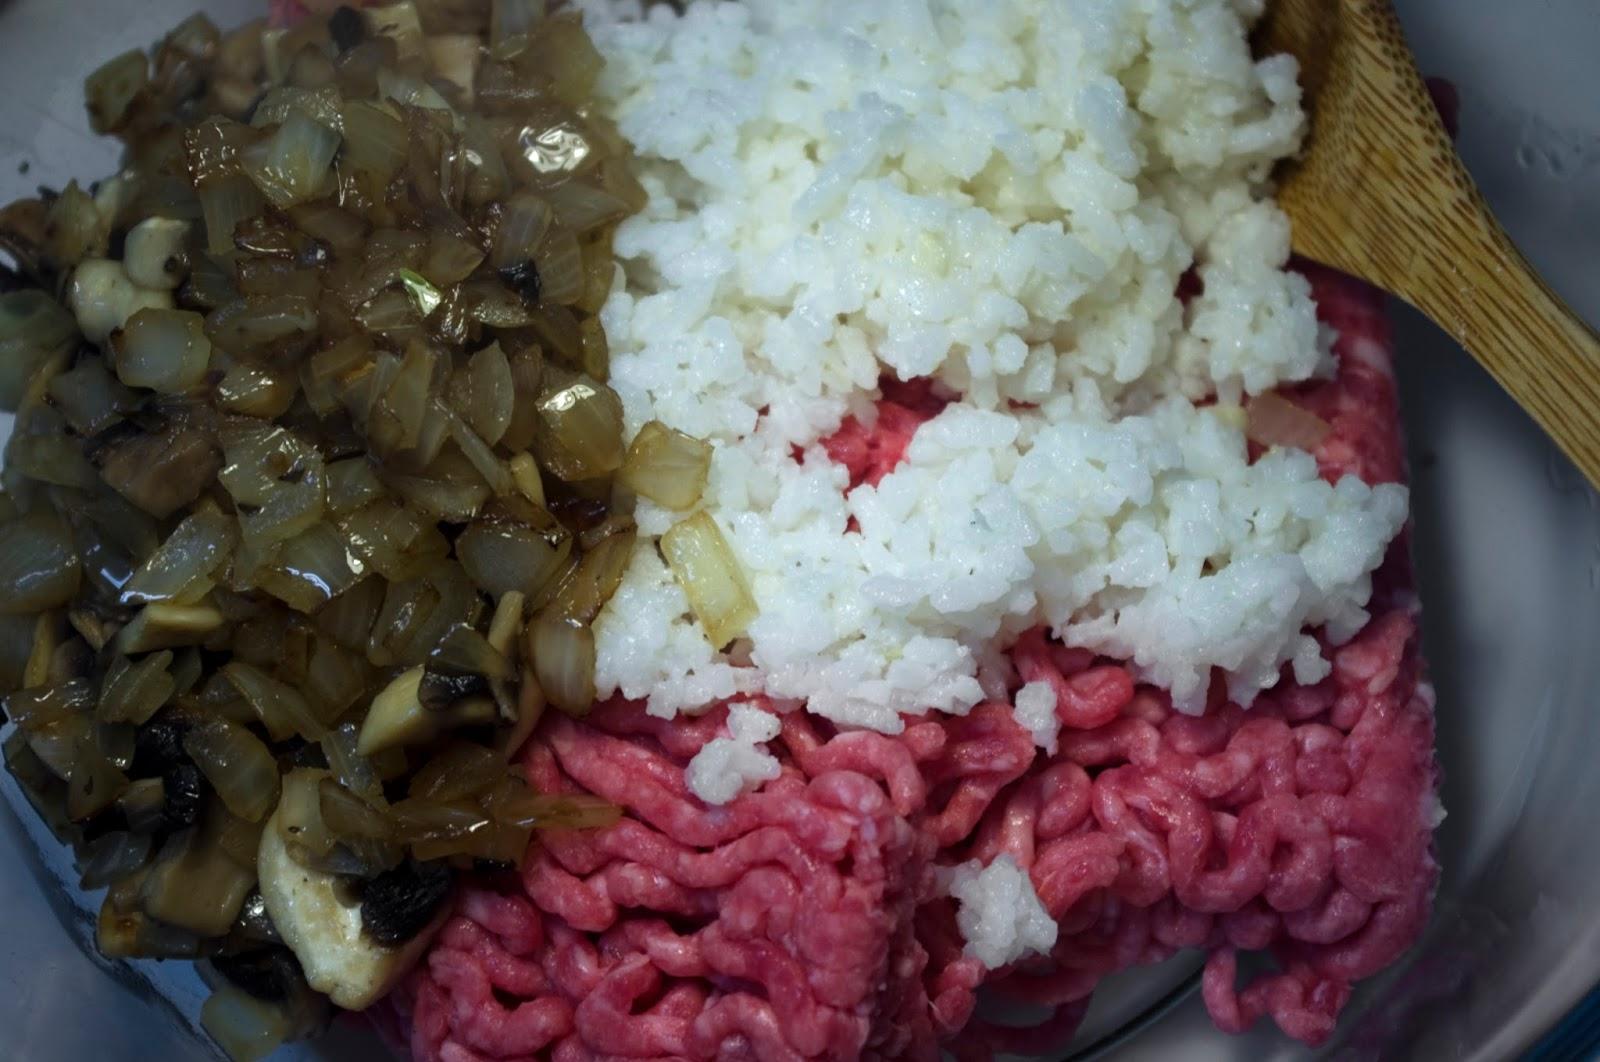 mezclamos carne, cebolla y arroz